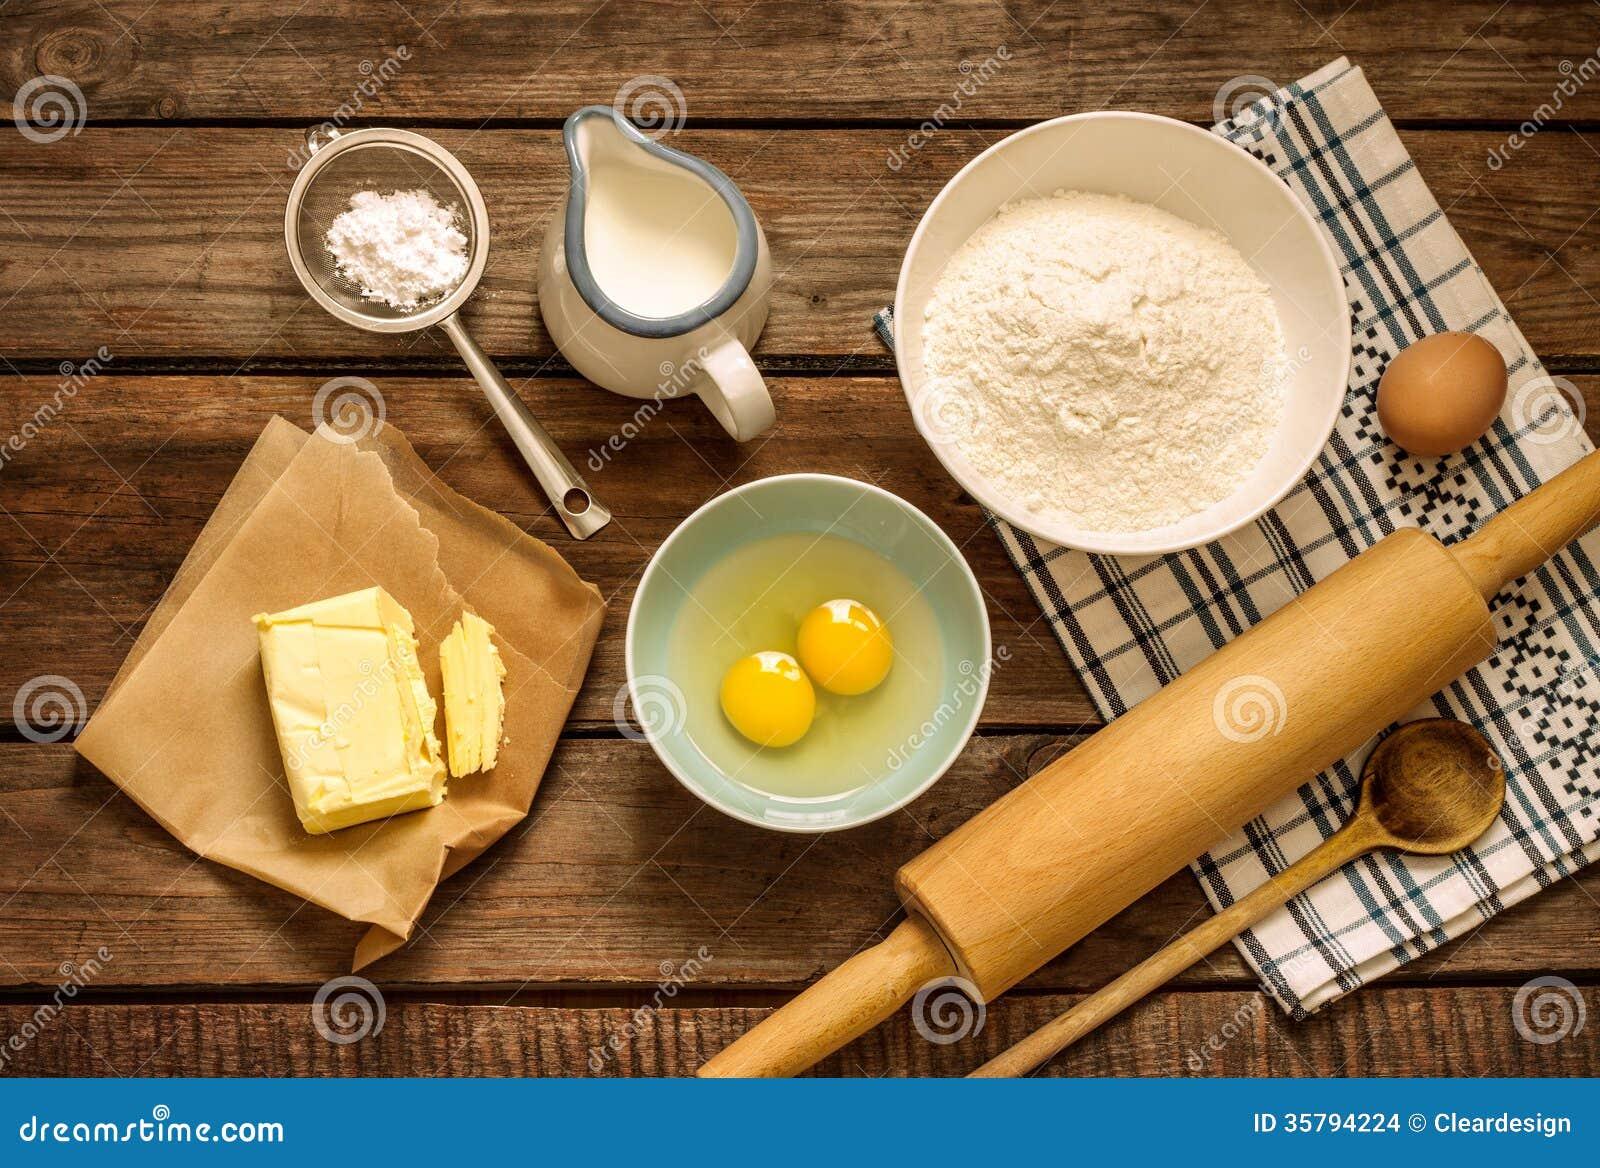 Dough Recipe Ingredients On Vintage Rural Wood Kitchen ...